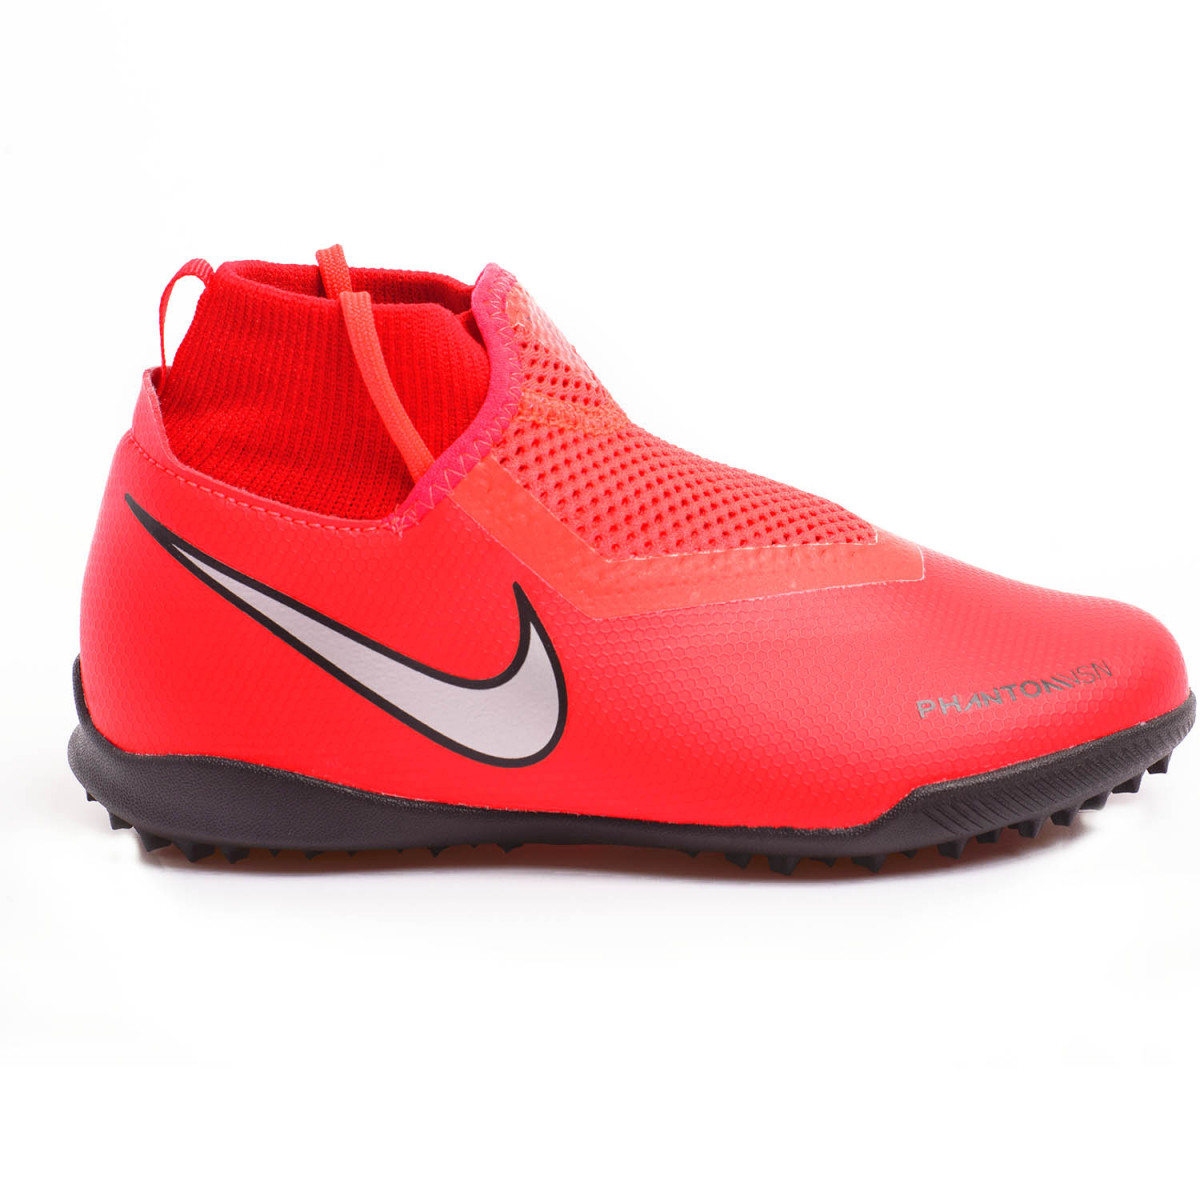 a5a9cd6a Botines Nike Jr Phantom Vision Academy Dynamic Fit Tf